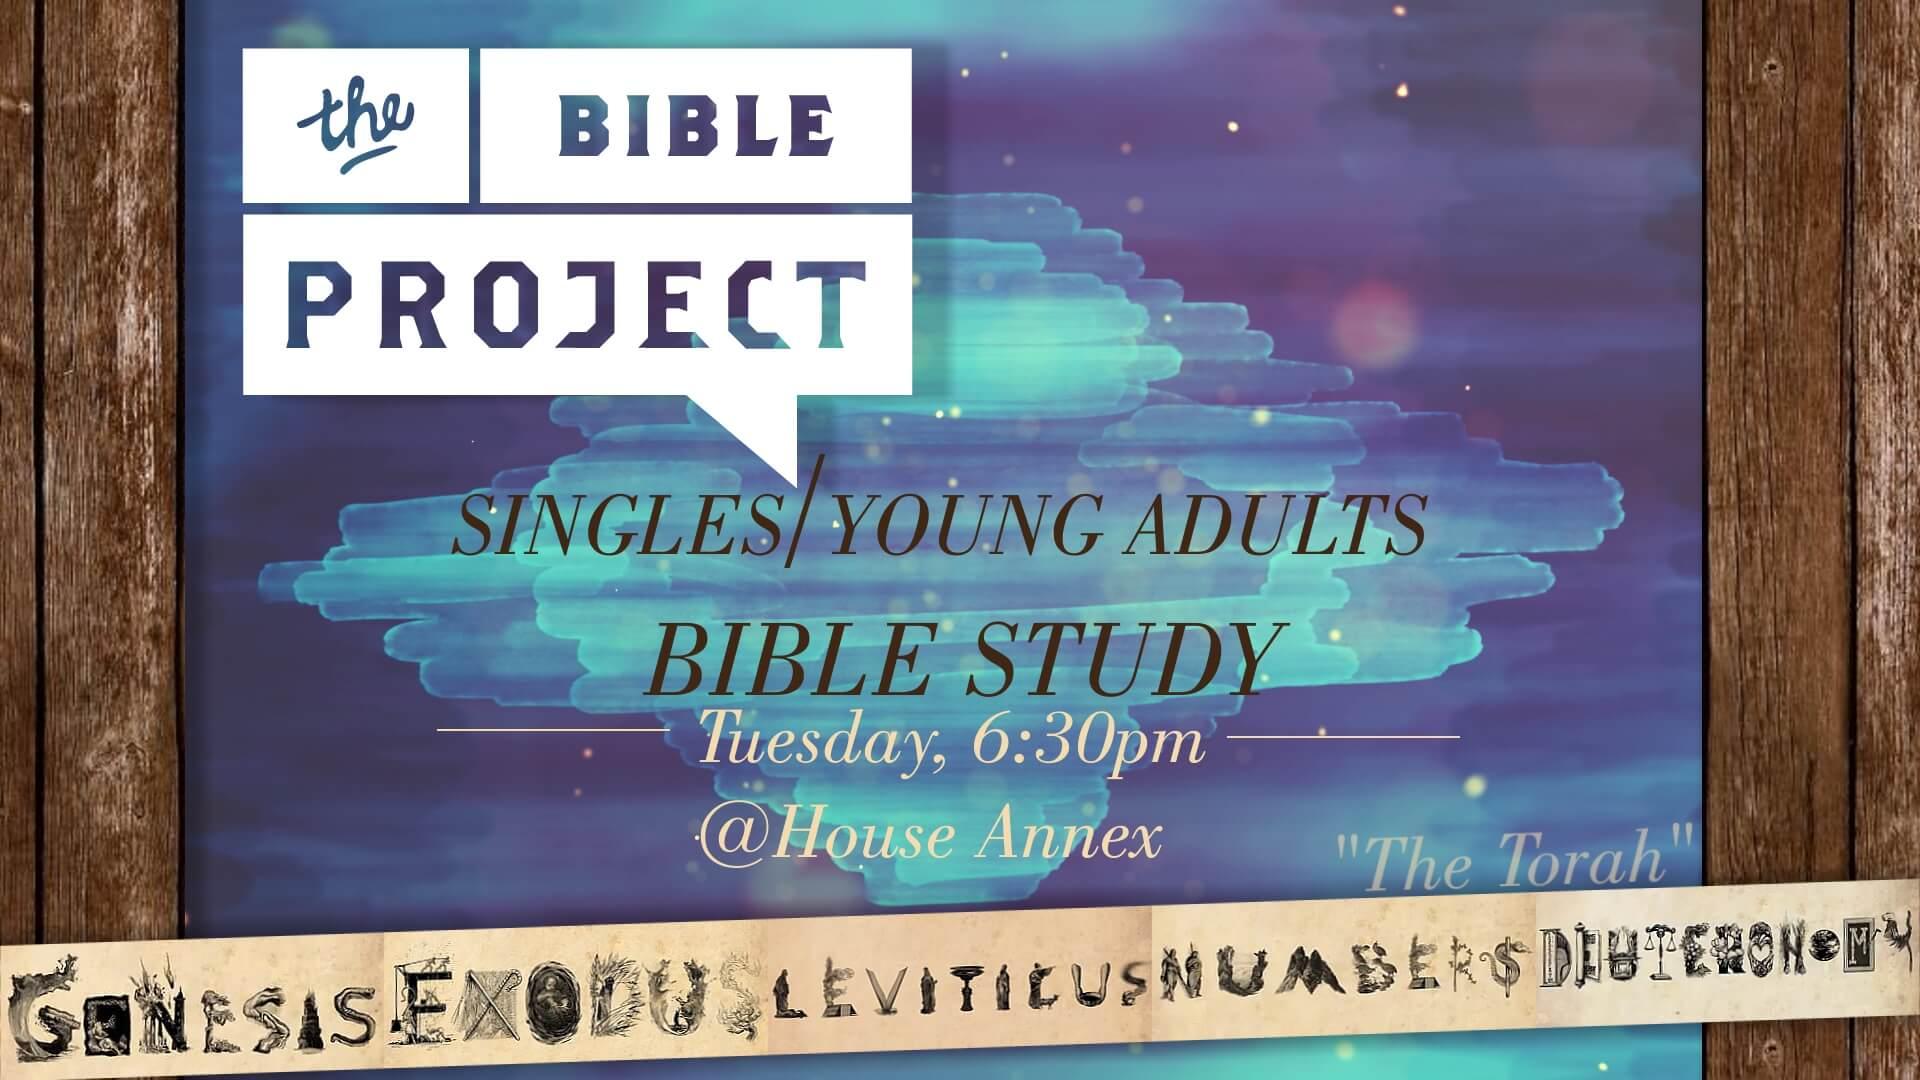 bible project bible study slide C